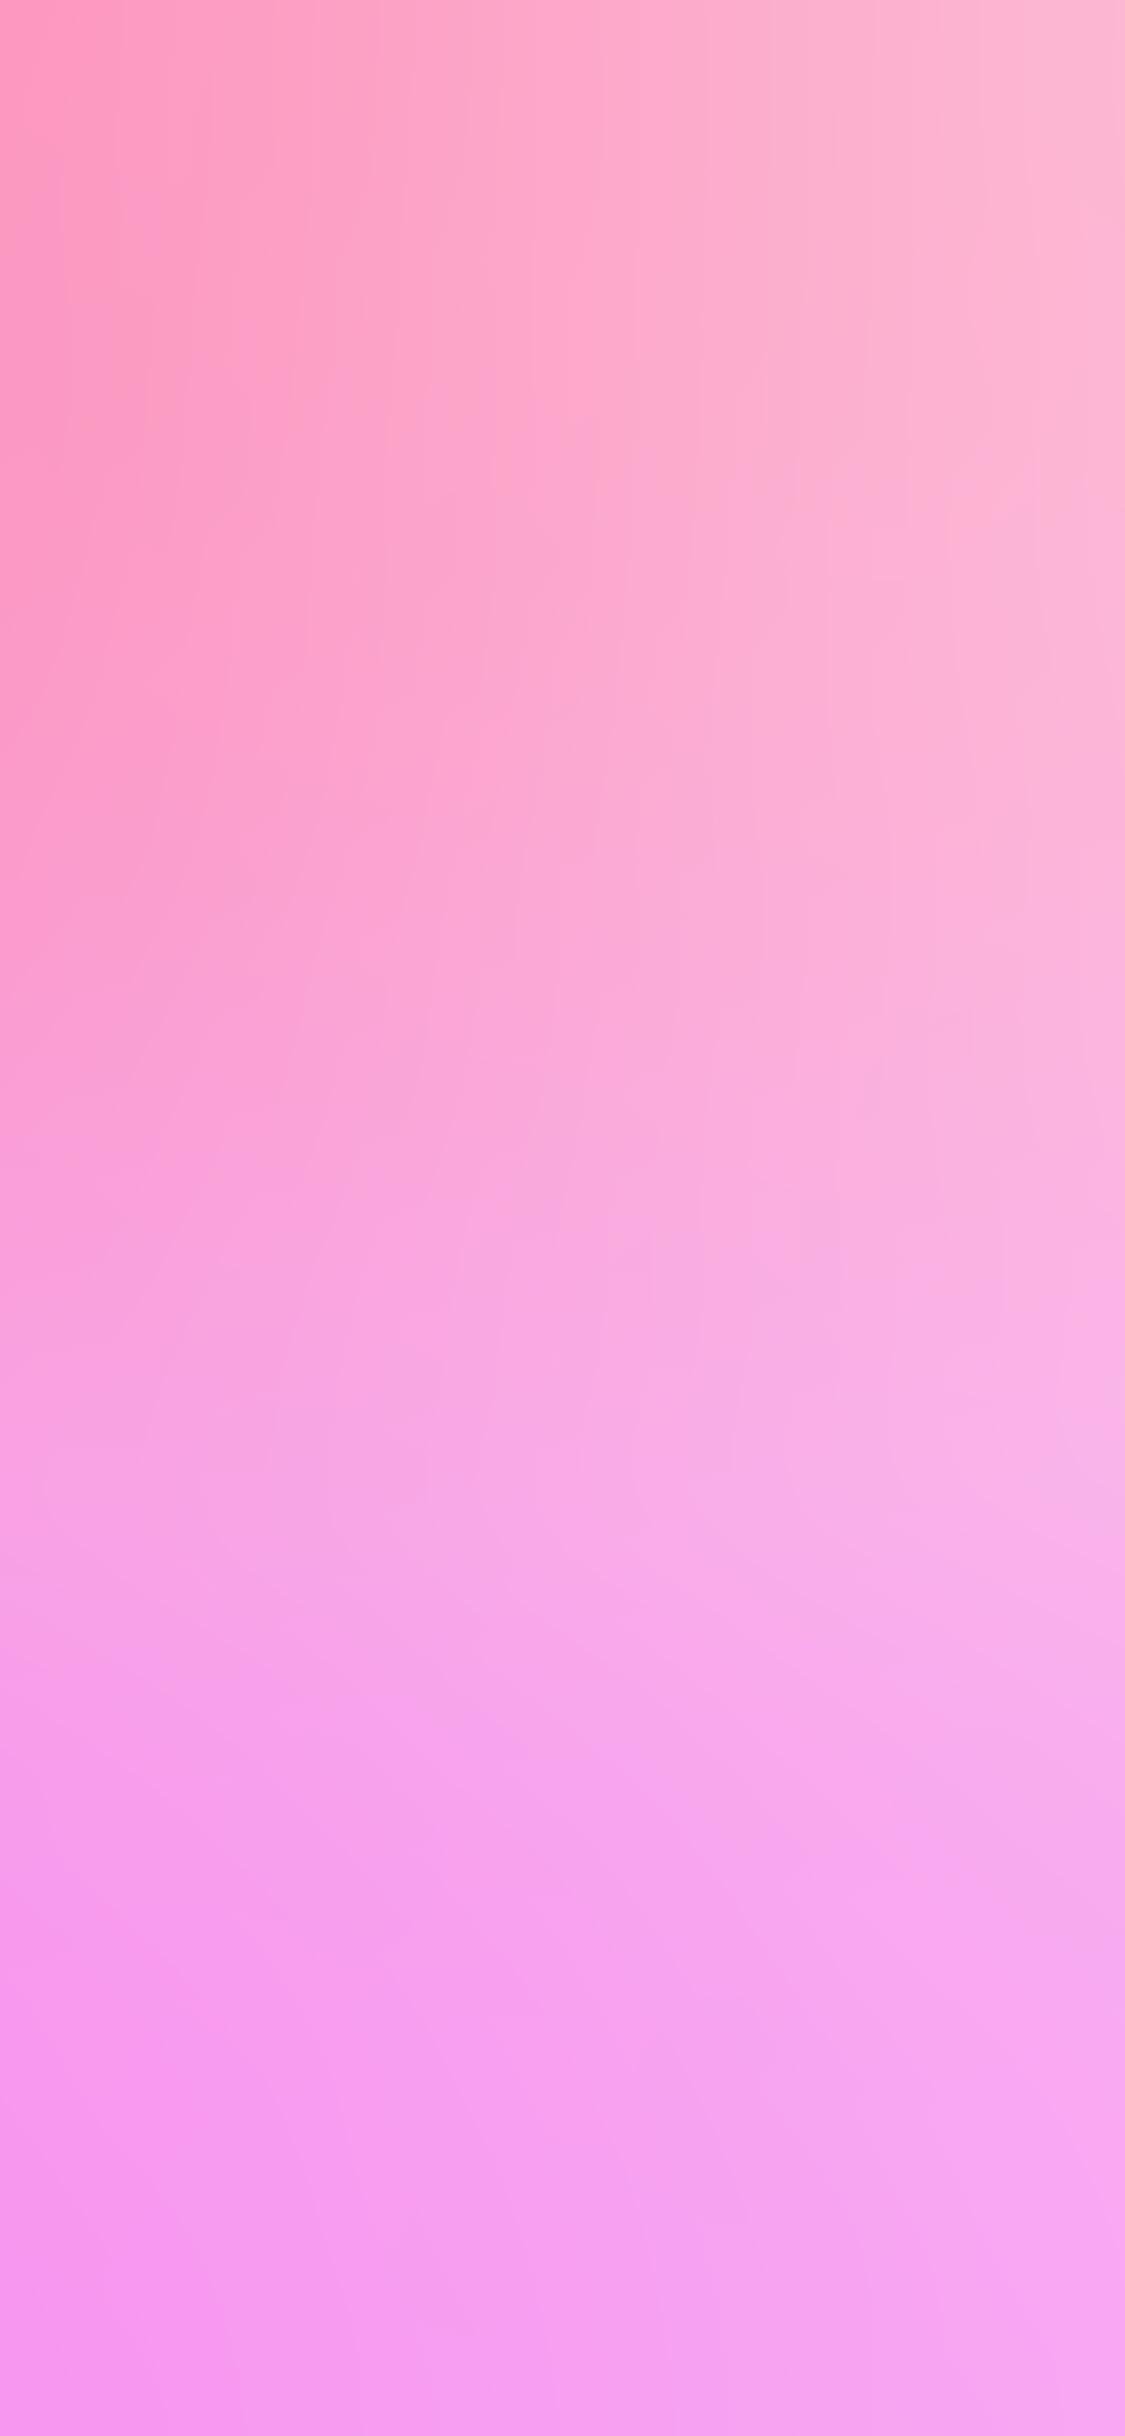 iPhonexpapers.com-Apple-iPhone-wallpaper-so14-purple-pink-pastel-soft-blur-gradation